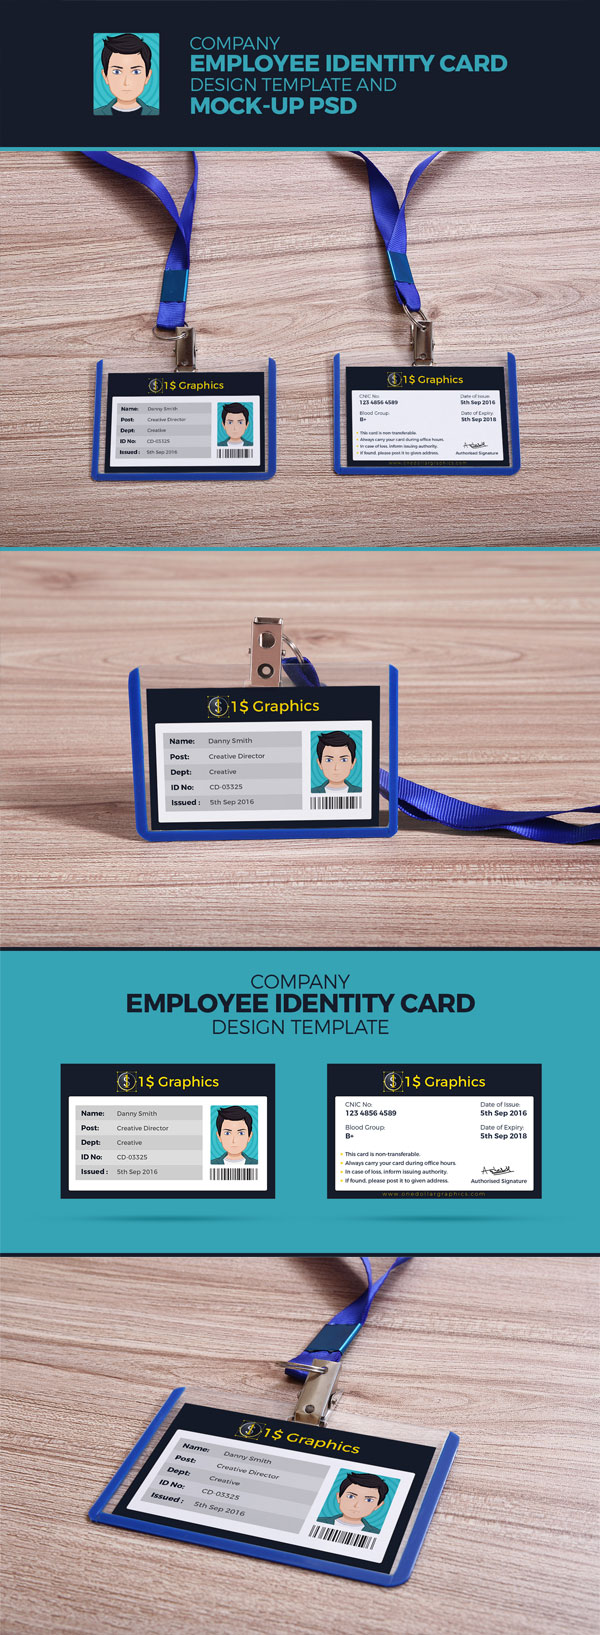 company-employee-identity-card-mock-up-psd-design-template